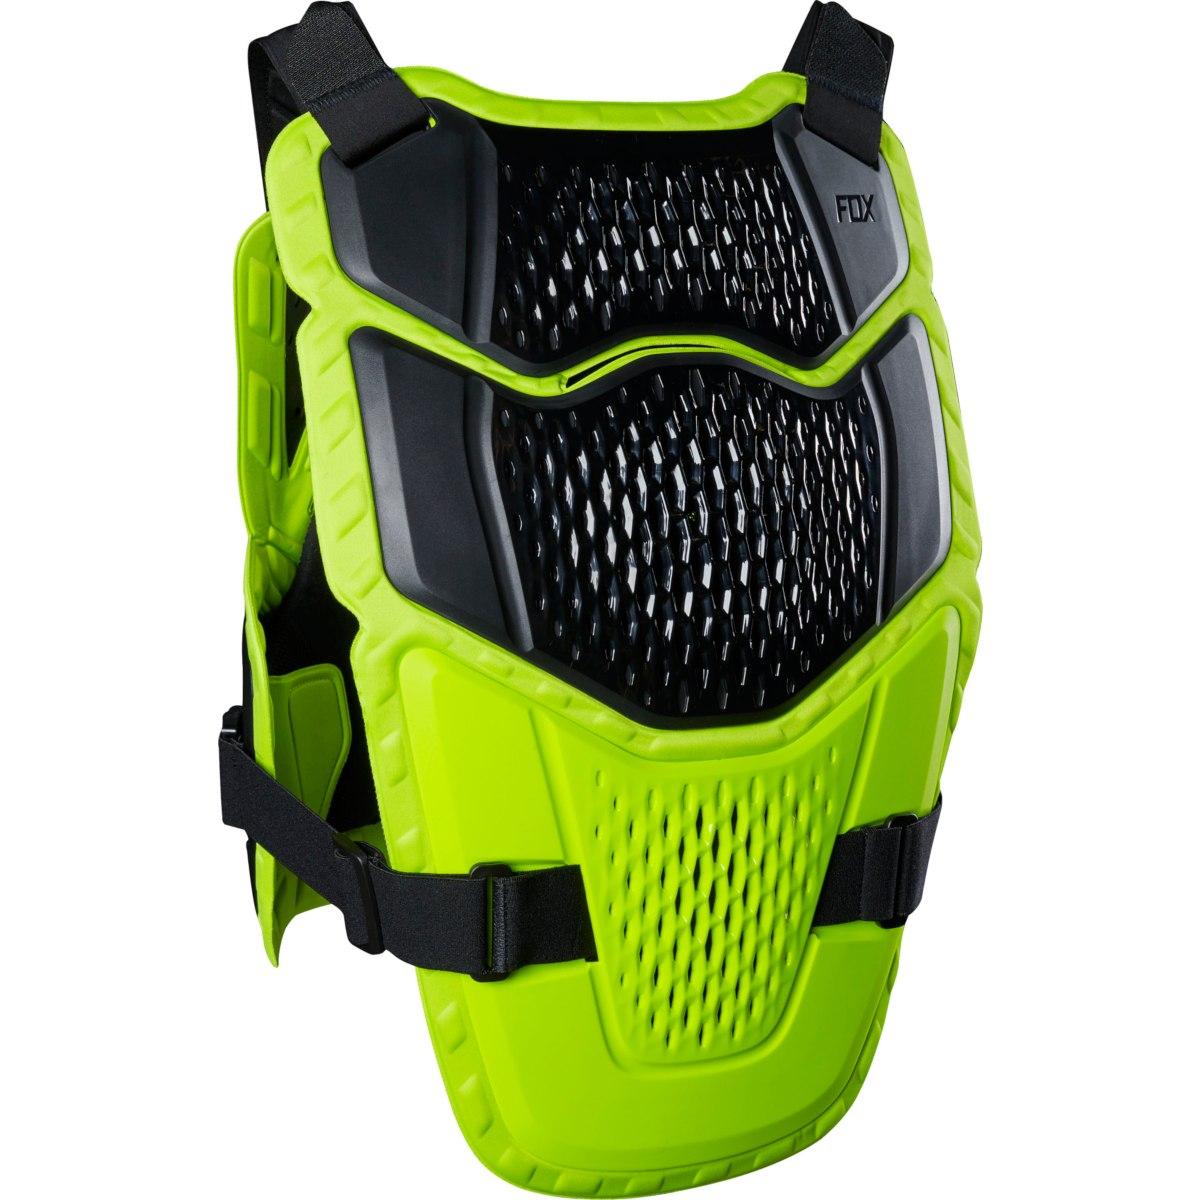 Image of FOX Raceframe Impact CE Protector - flo yellow